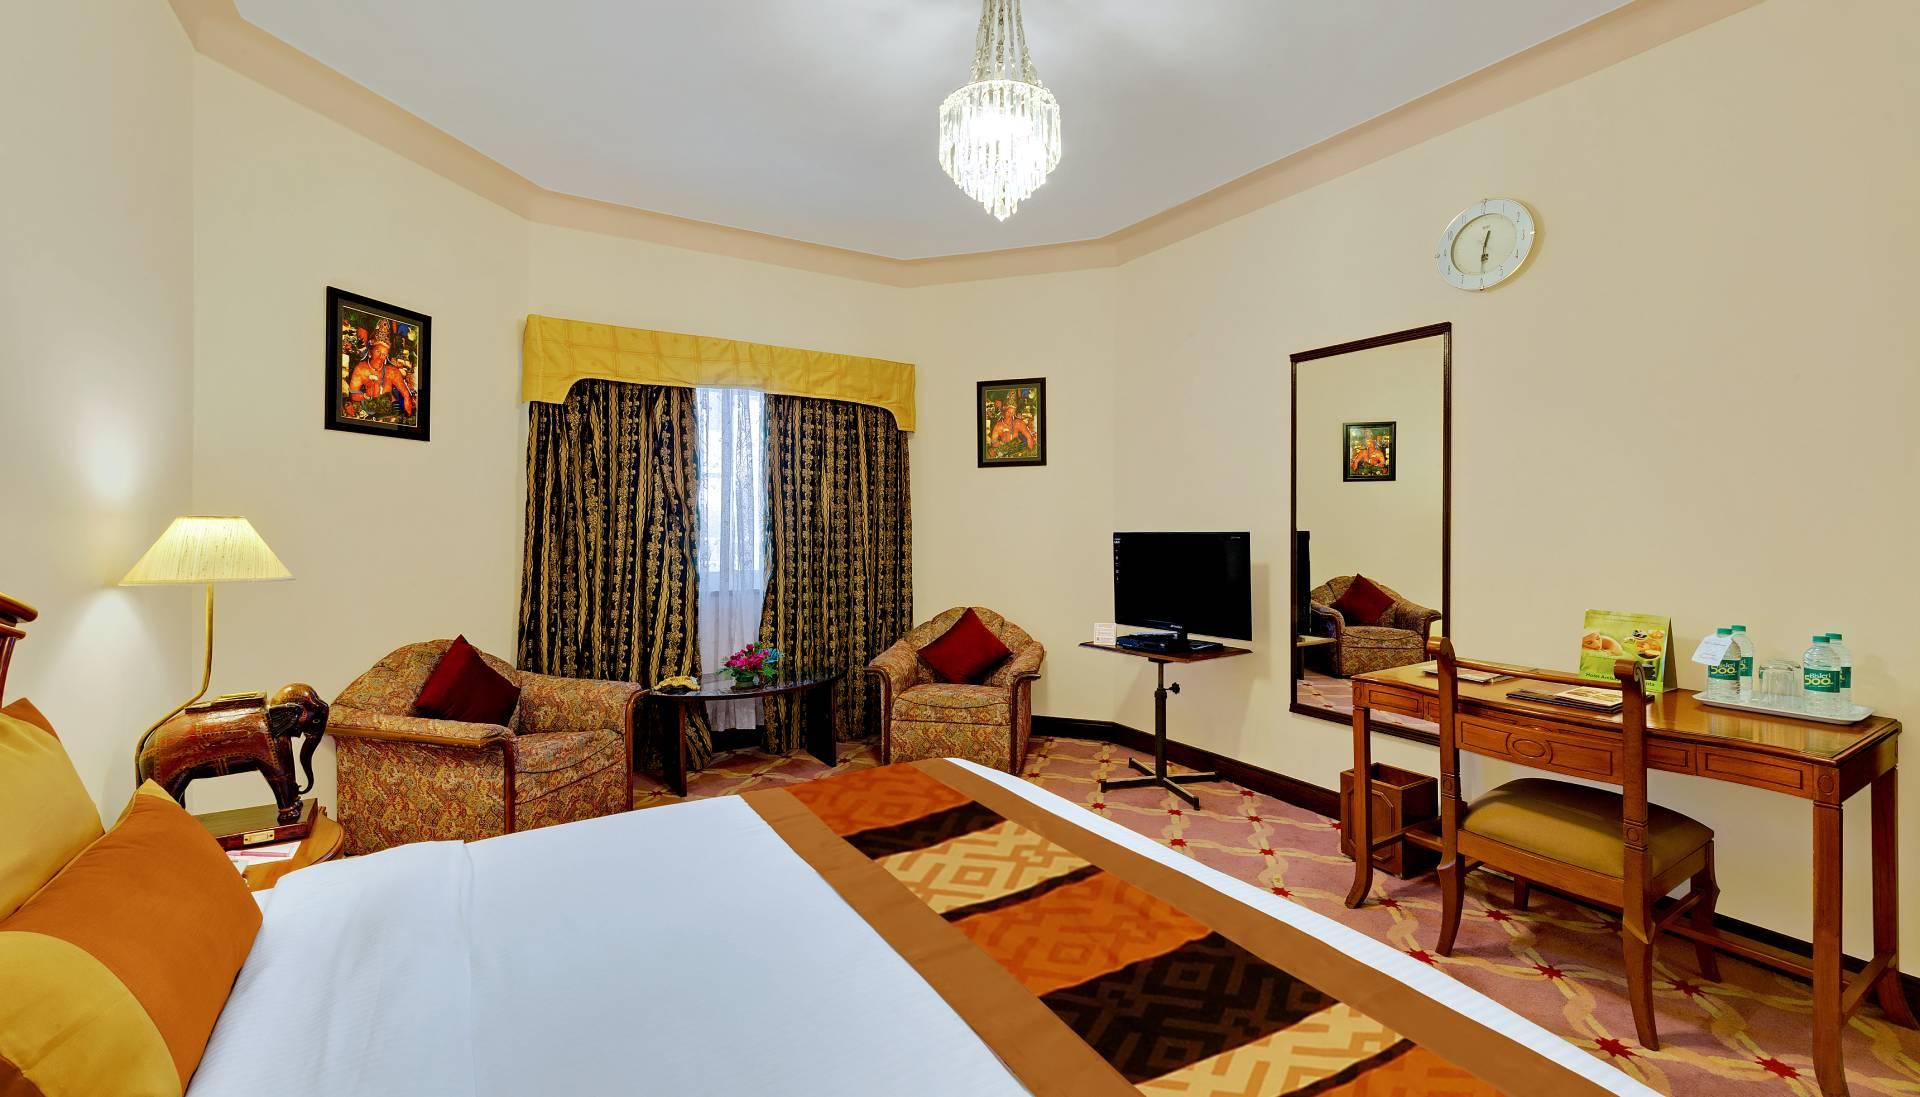 presidential suite 3 ambassador ajanta aurangabad - The Ambassador   Heritage Hotels in Mumbai, Aurangabad, Chennai - Presidential Suite